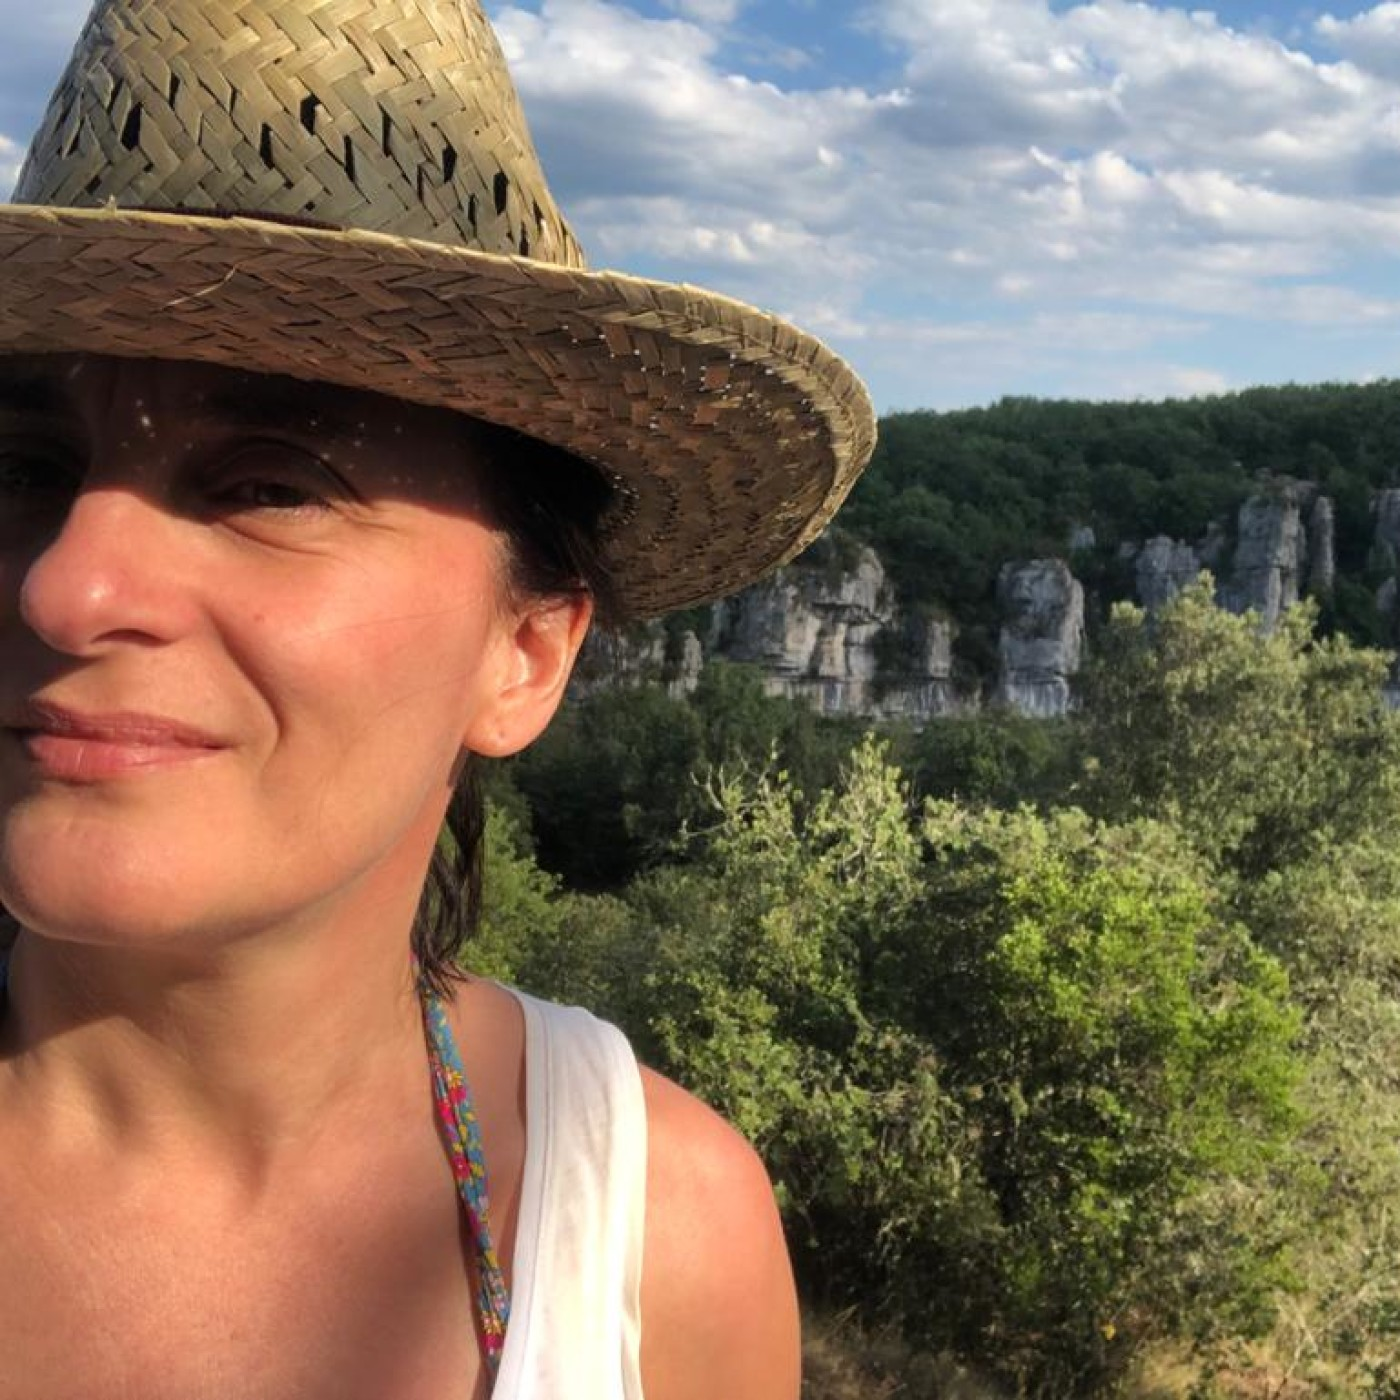 Agnes raconte son expatriation de 18 ans au Chili - 16 01 2021 - StereoChic Radio